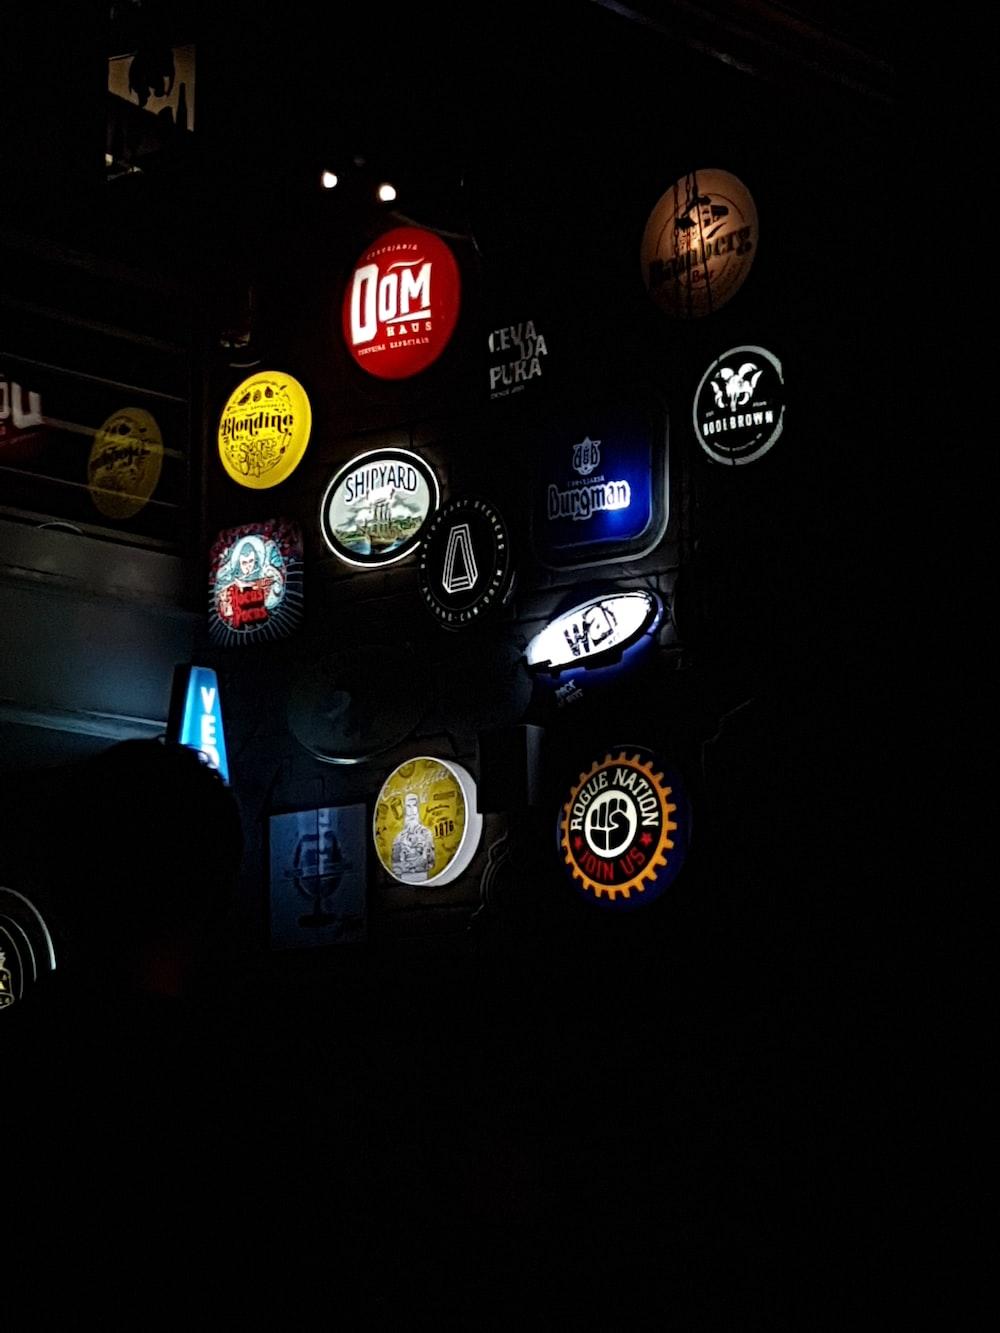 A Beer Bar In Sao Paulo Photo By Gabriel Broggini Vargas Bargaz Dark Blue Gabroggini On Unsplash